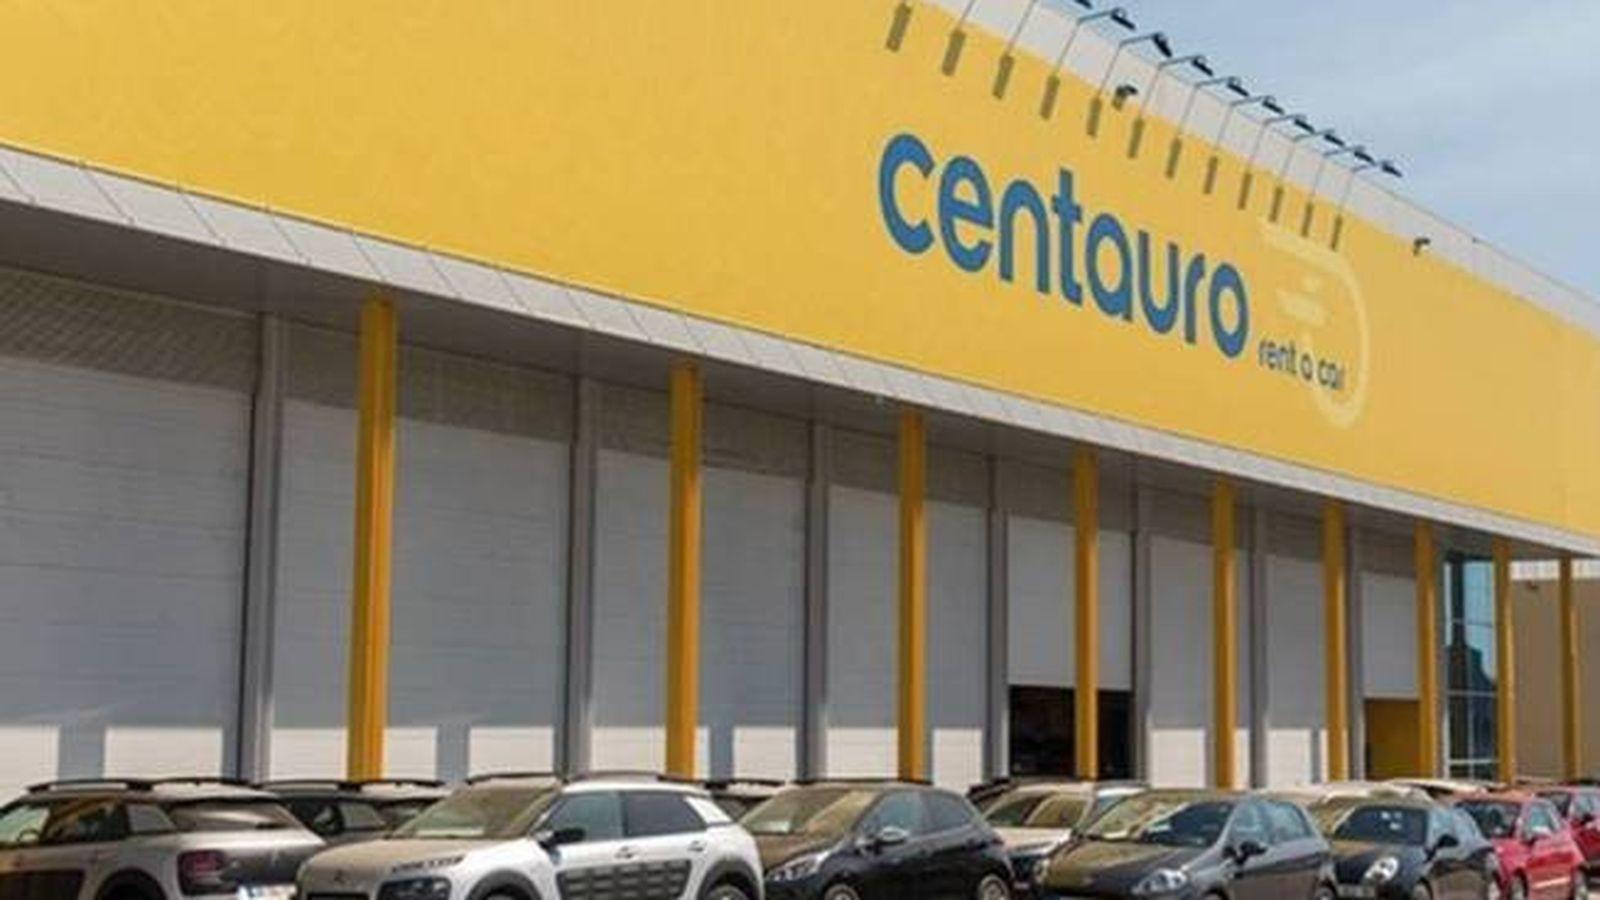 Foto: Oficina de Centauro en Oporto